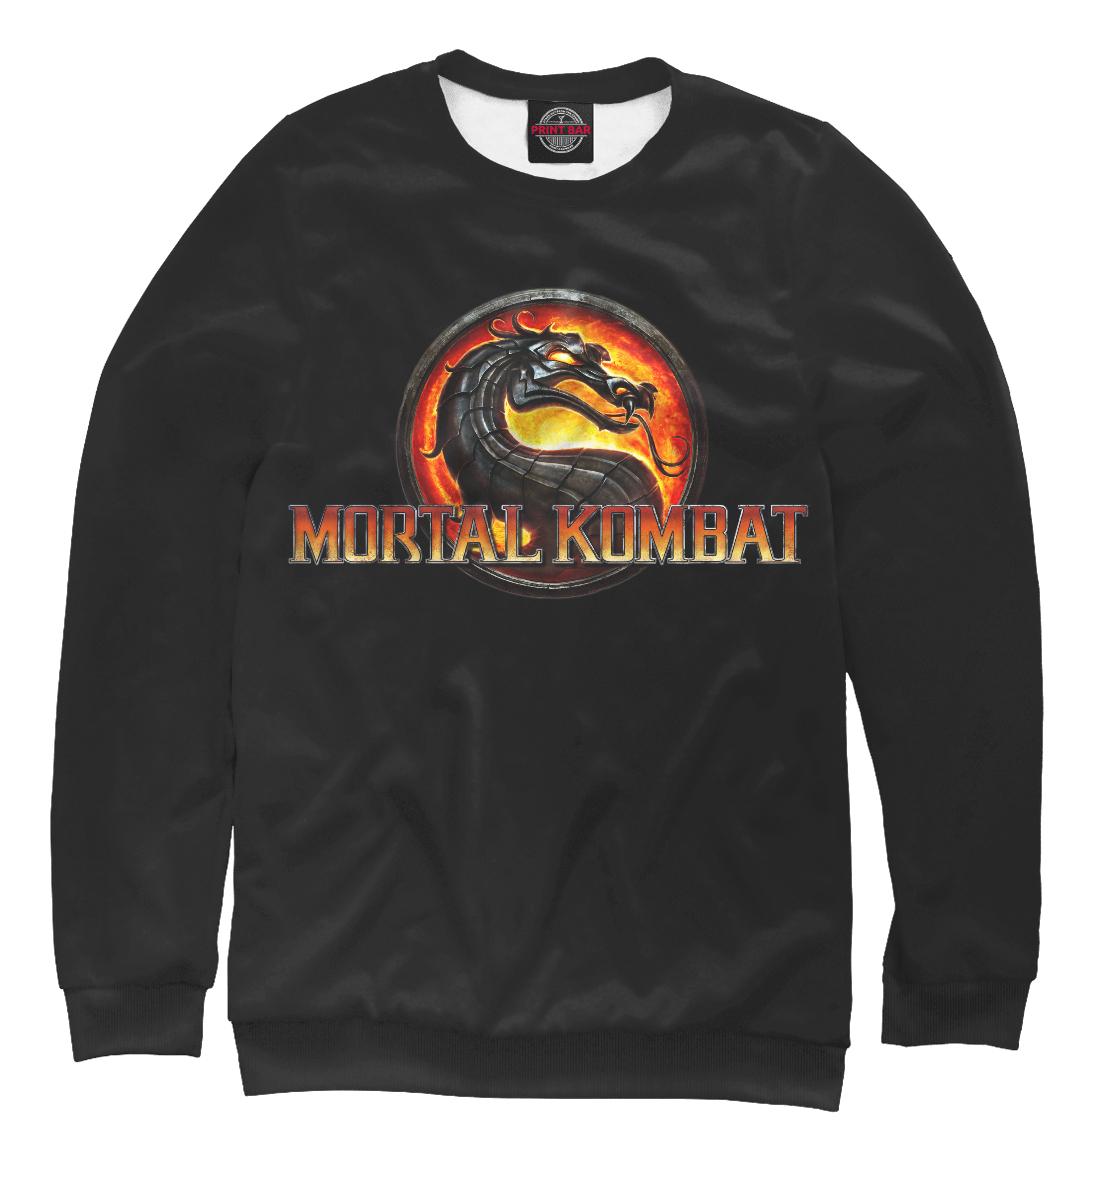 Купить Mortal Kombat, Printbar, Свитшоты, MKB-178210-swi-2